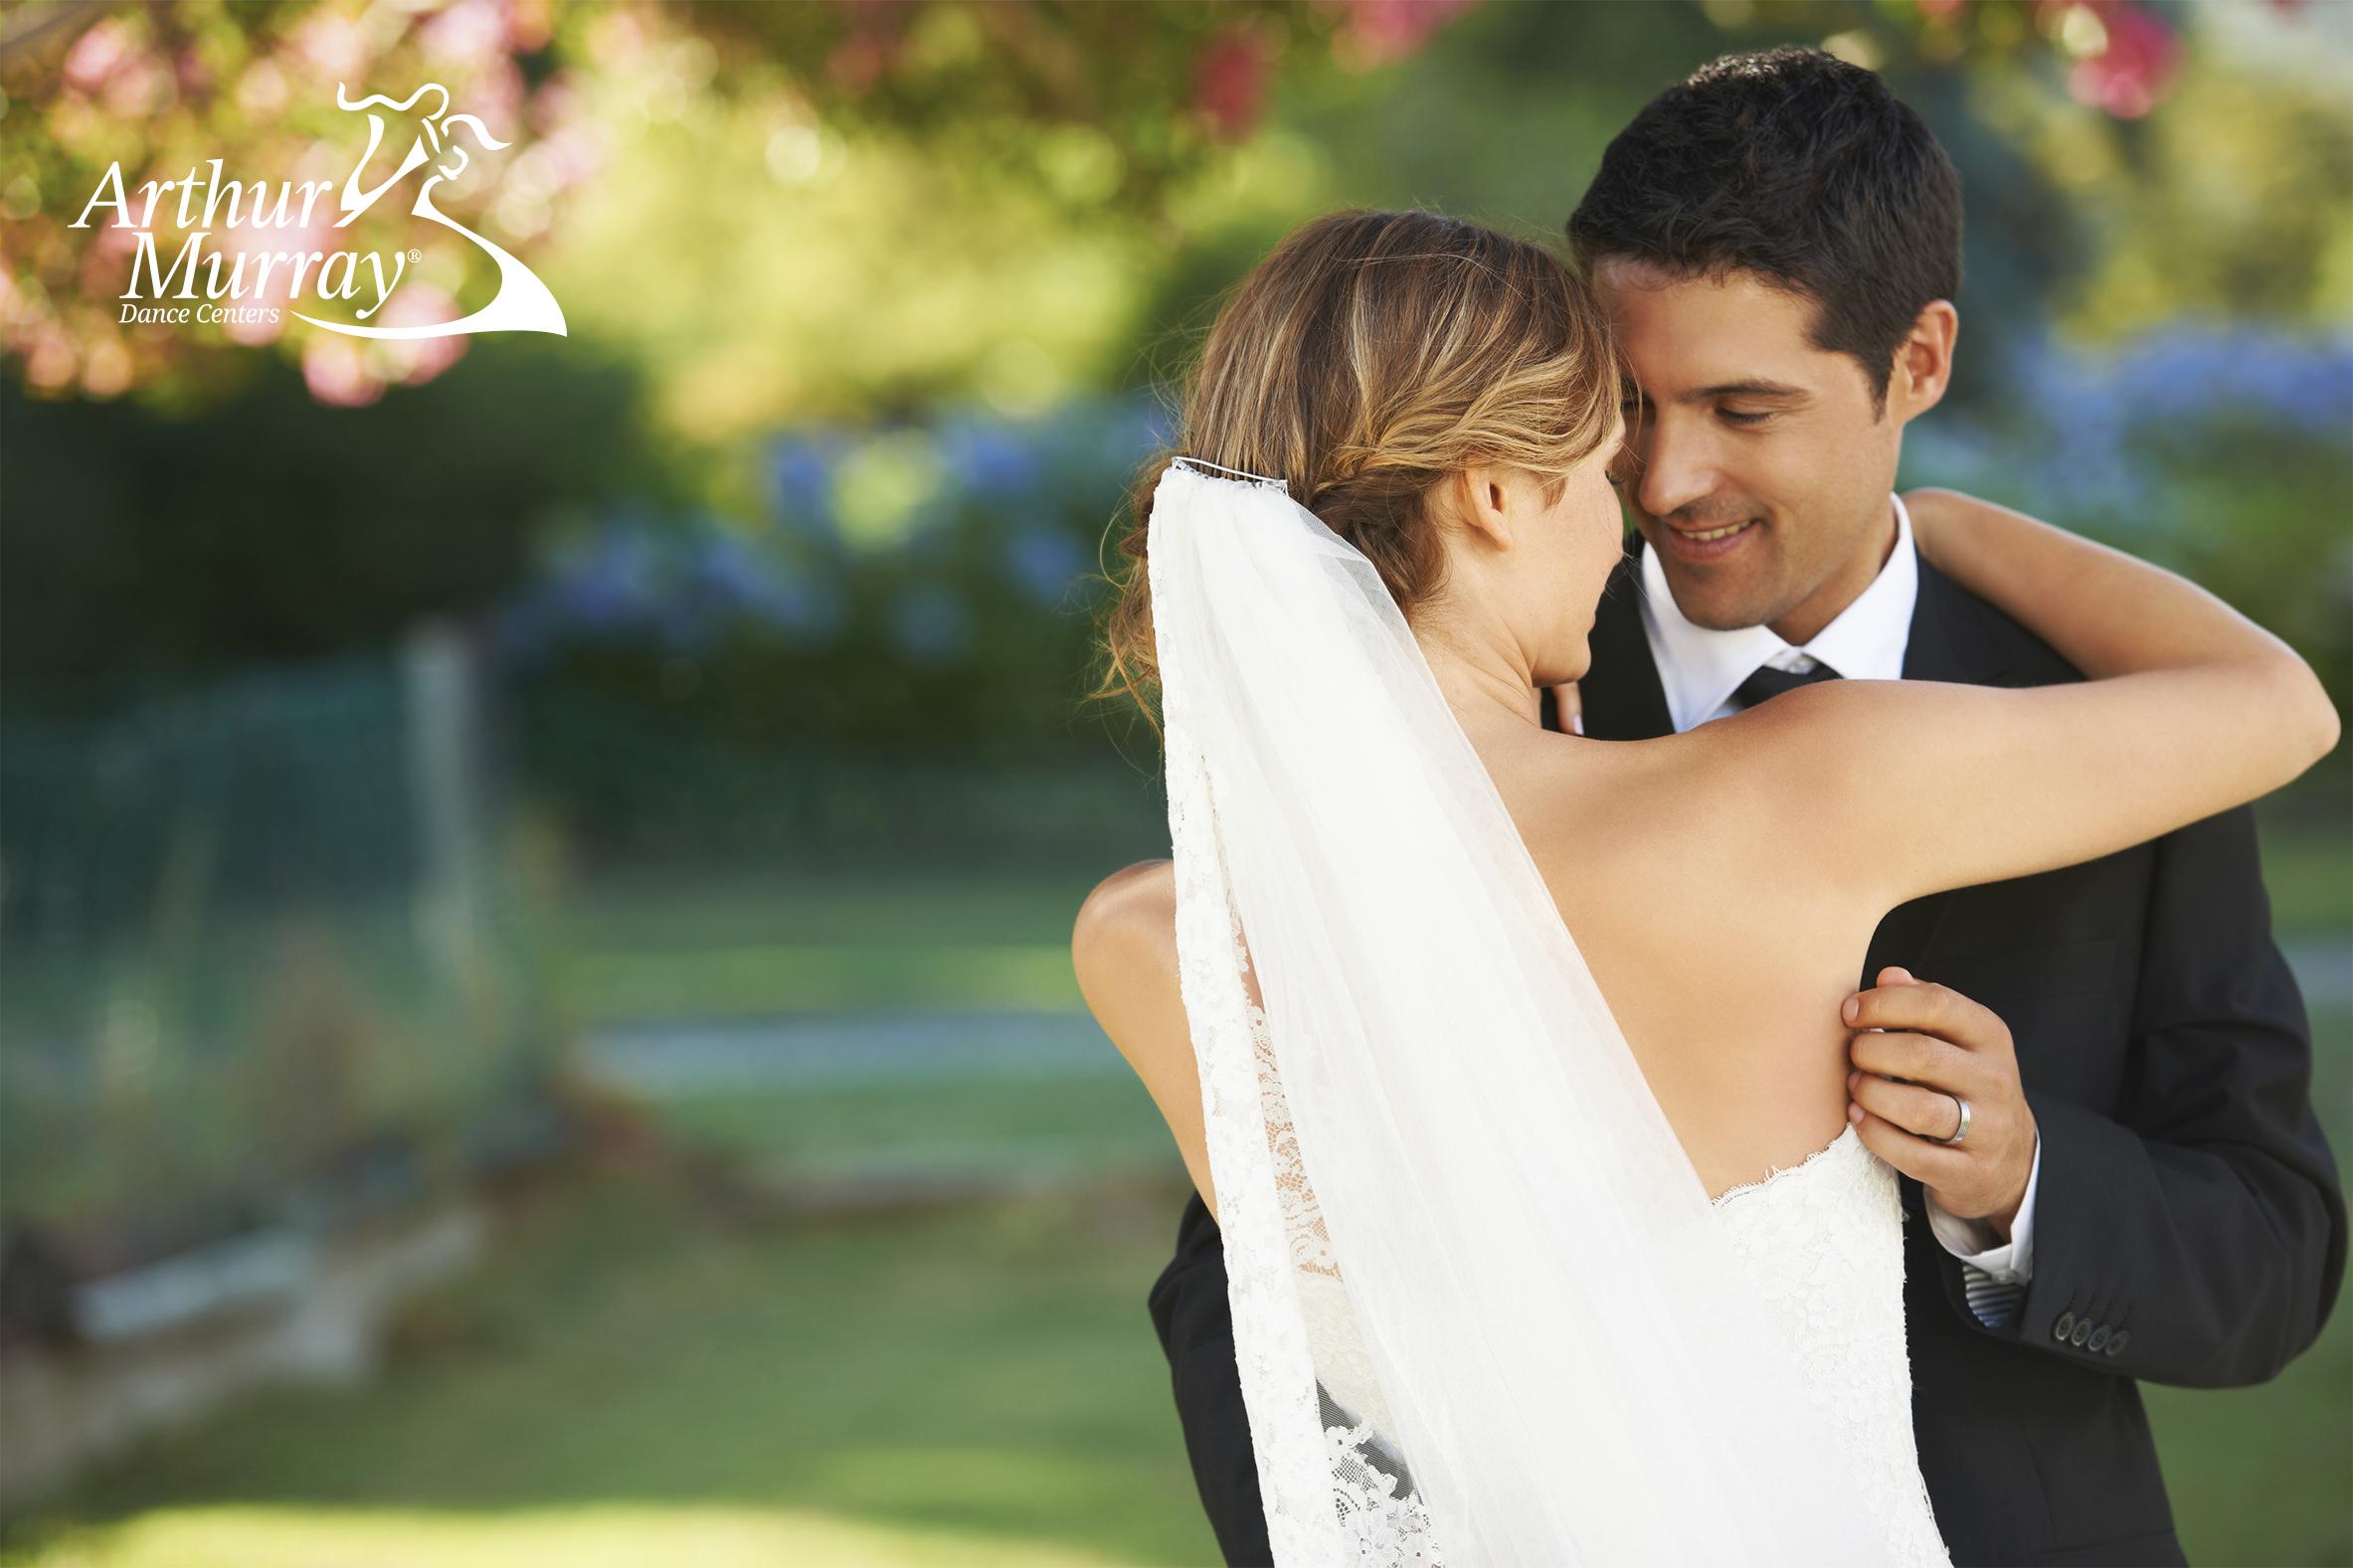 http___arthurmurrayfranchisee.com_system_files_WeddingGarden_0.jpg